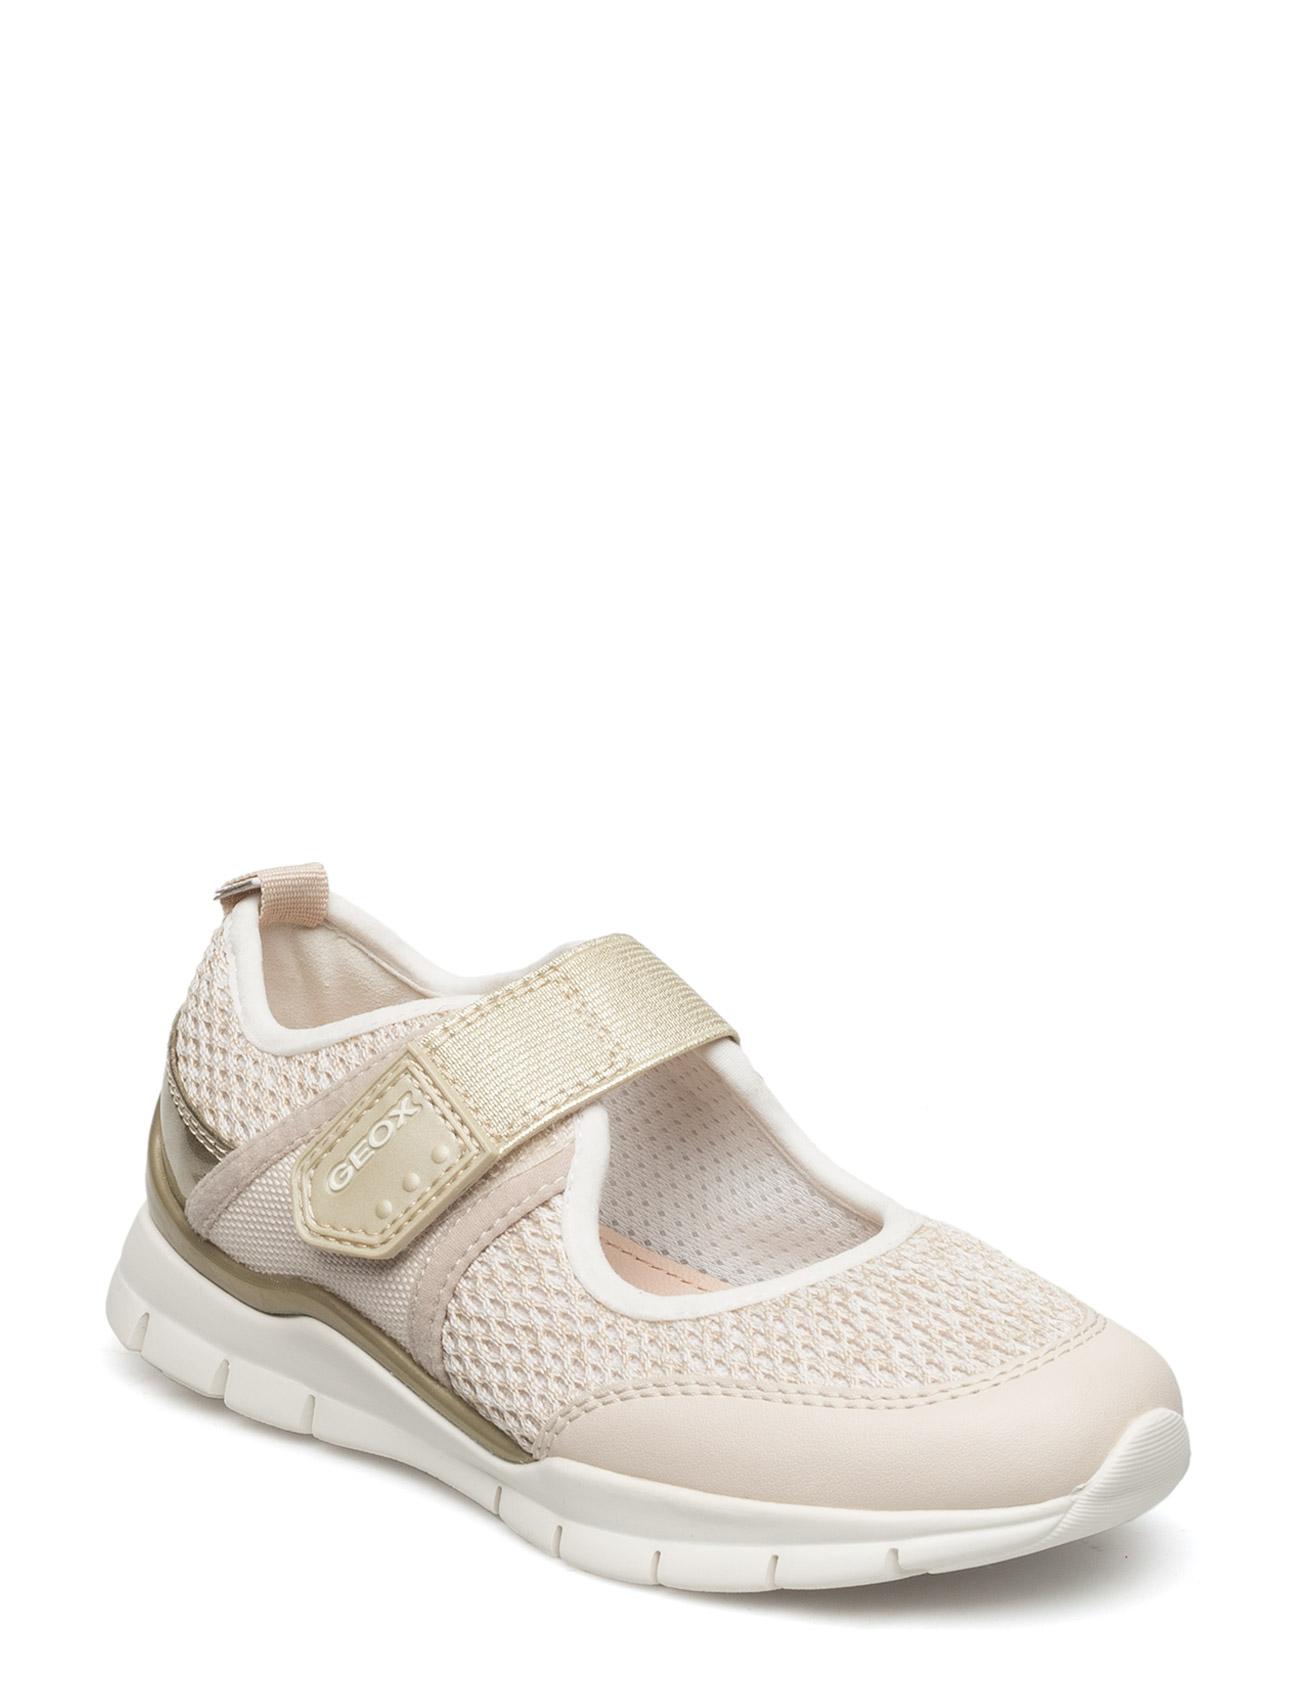 J Sukie Girl GEOX Sko & Sneakers til Børn i elfenben